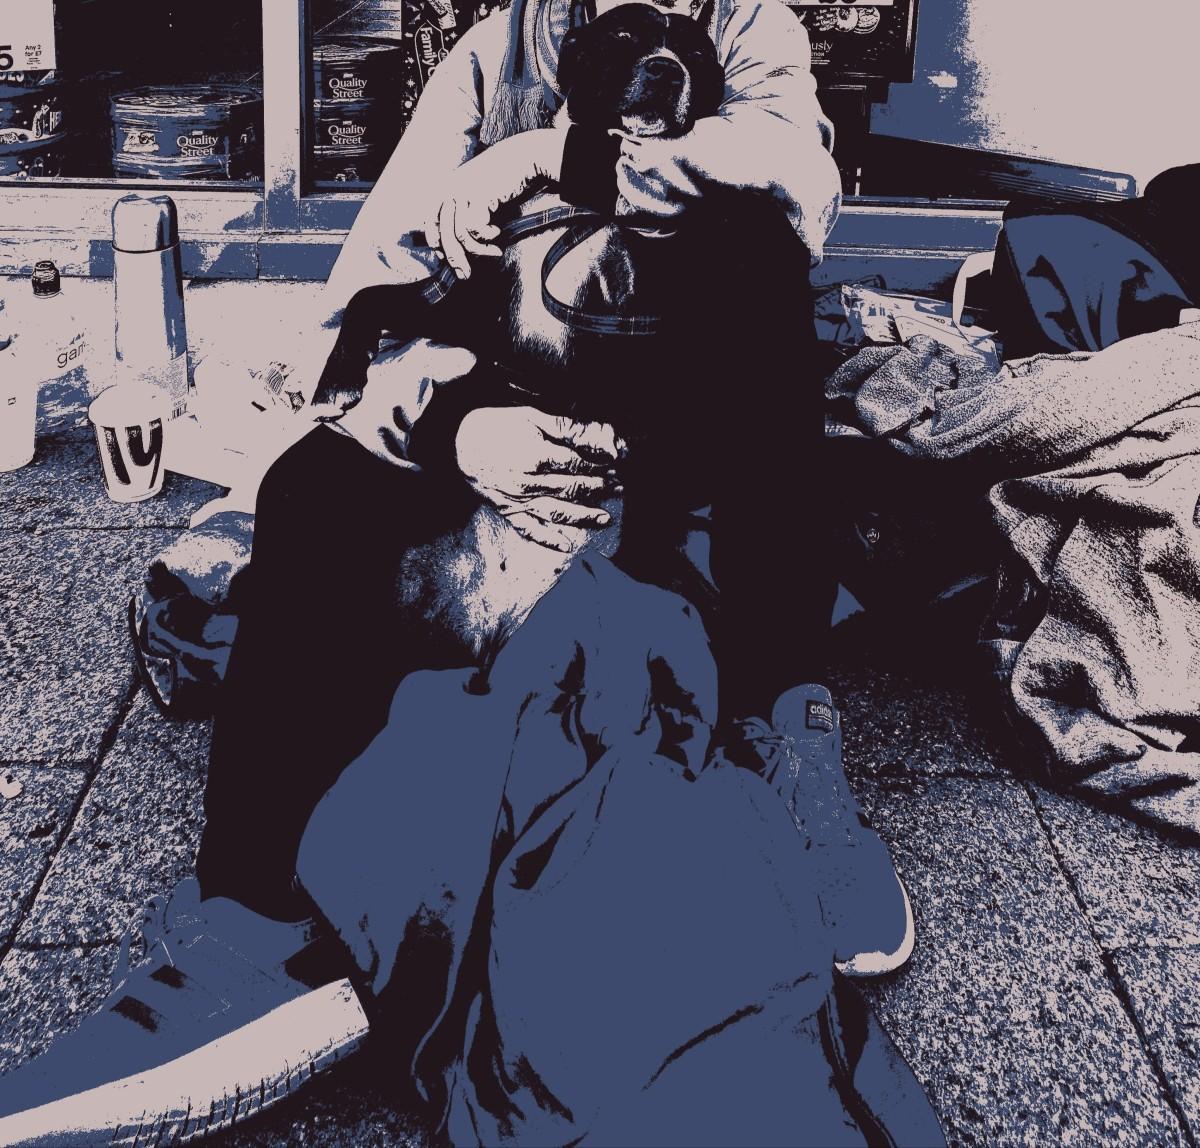 My homeless friend🙁